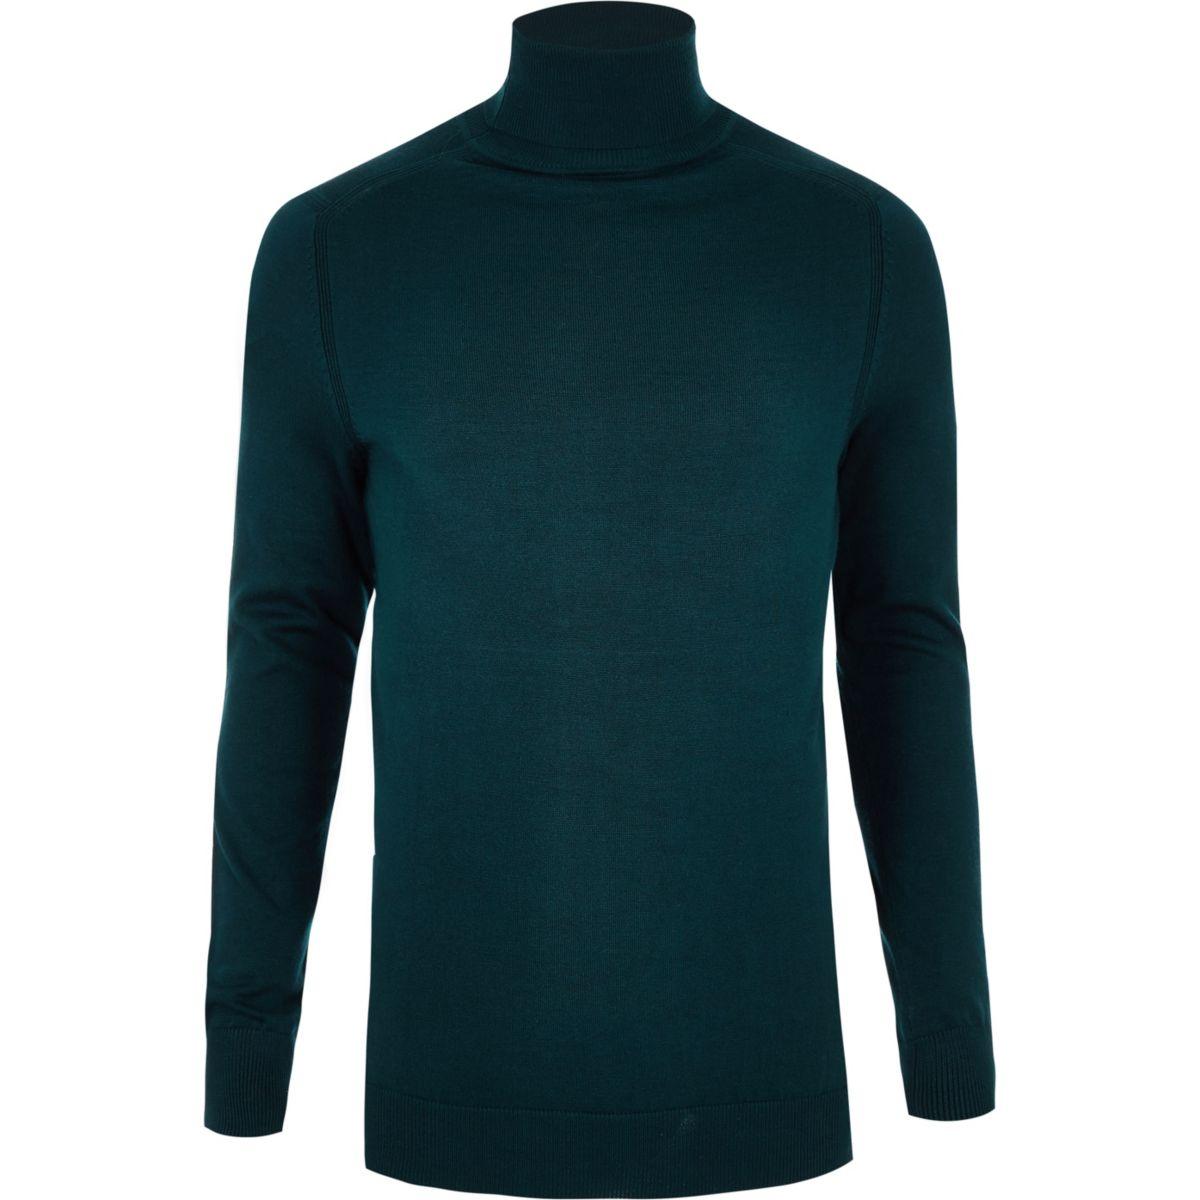 Dark green slim fit roll neck sweater